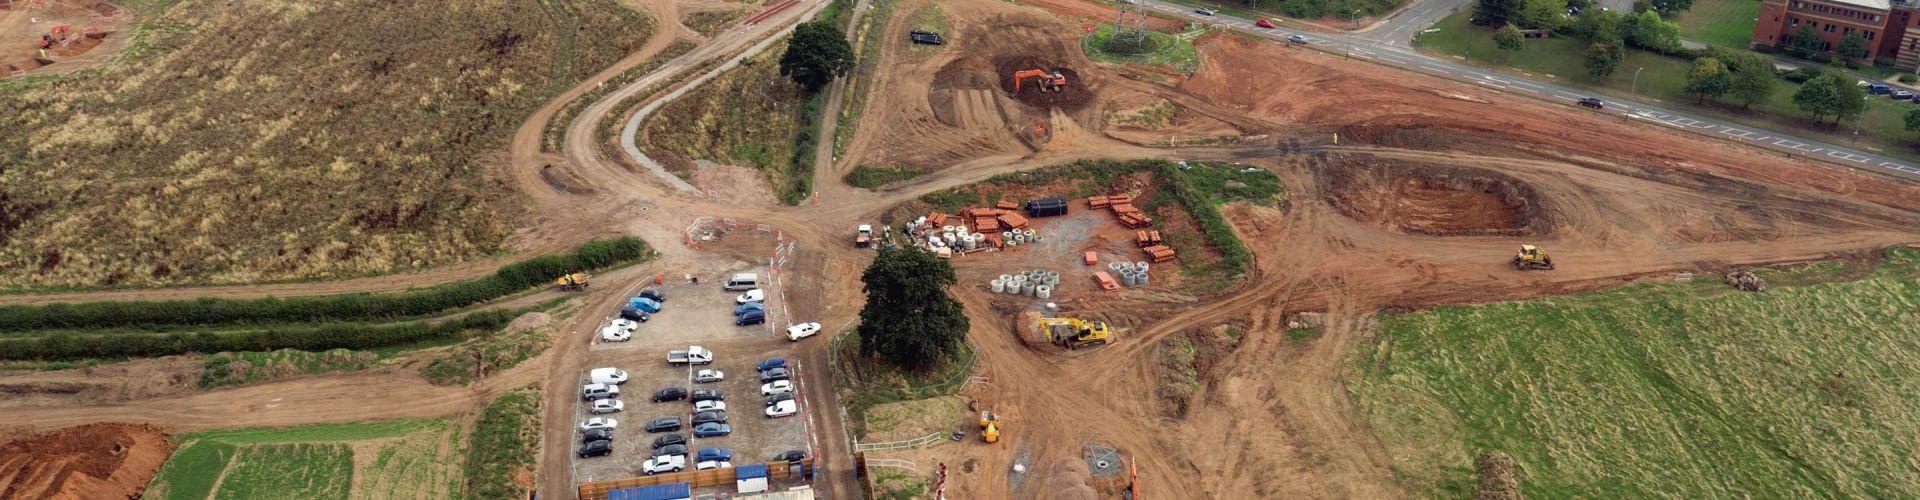 Case study Broadening Catesby's Scope – Myton Green_Banner.jpg